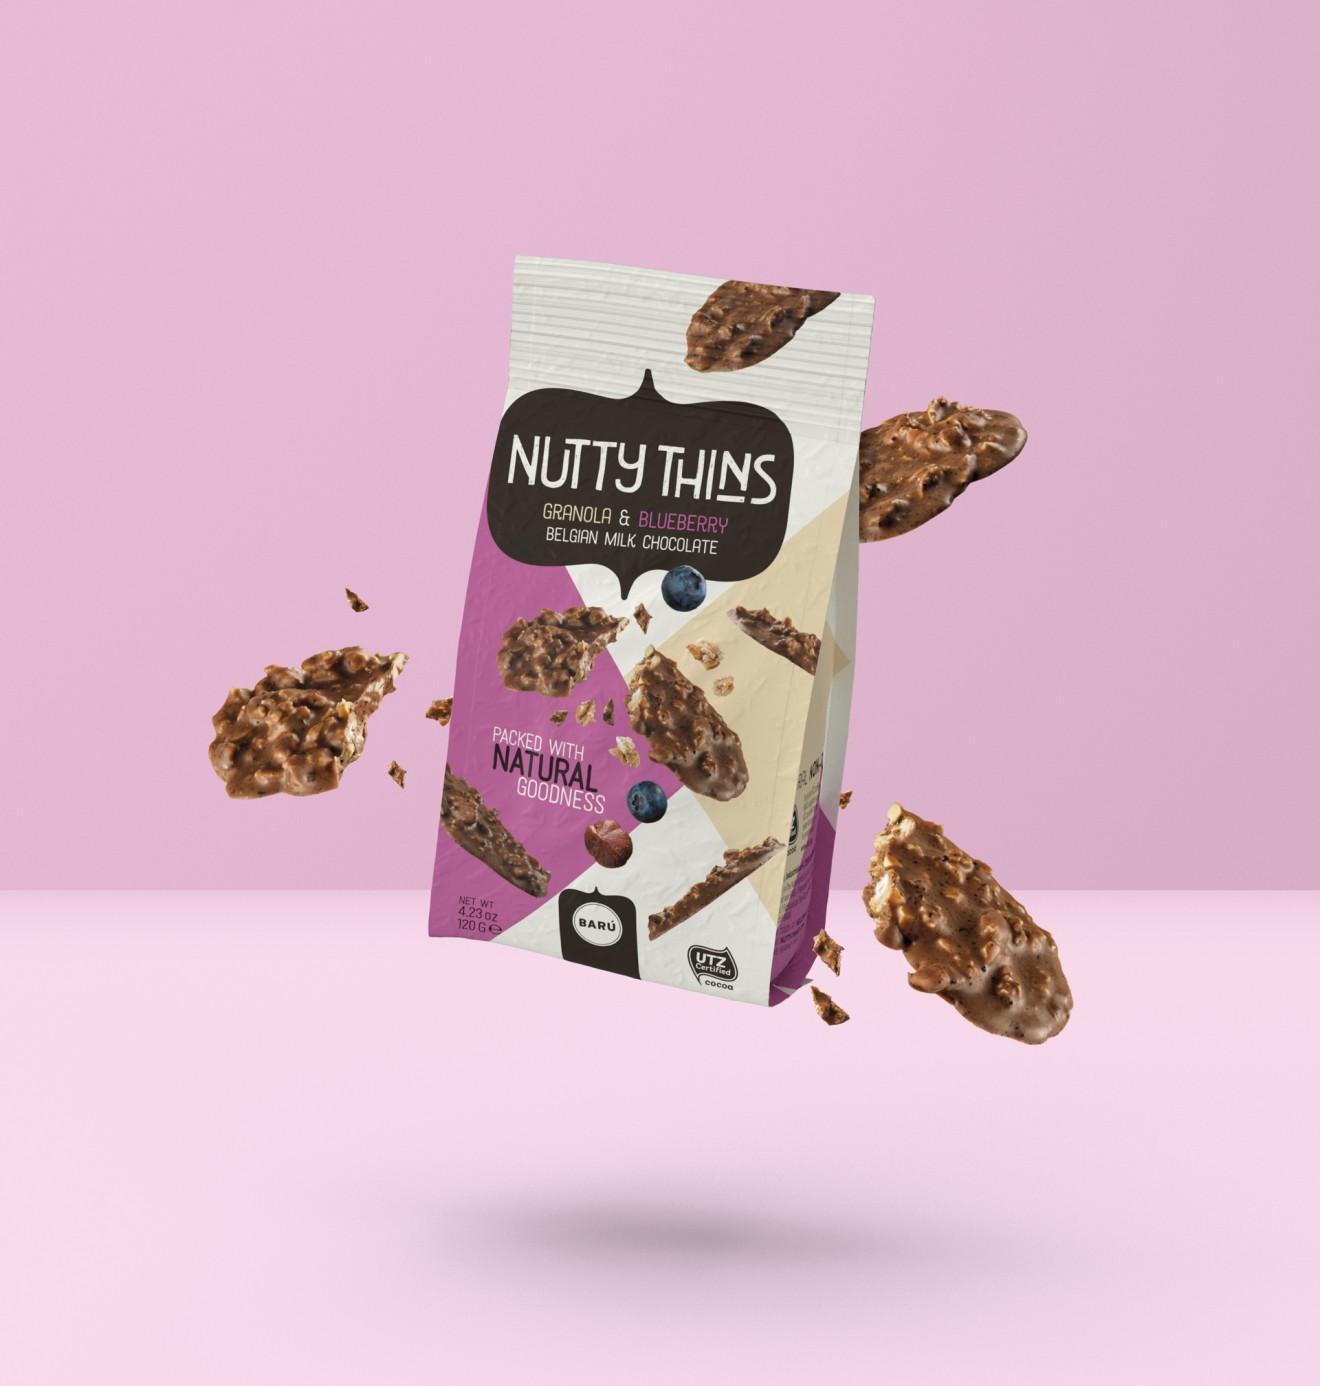 Quatre Mains package design - indulgence, lekker, krokant, snacking